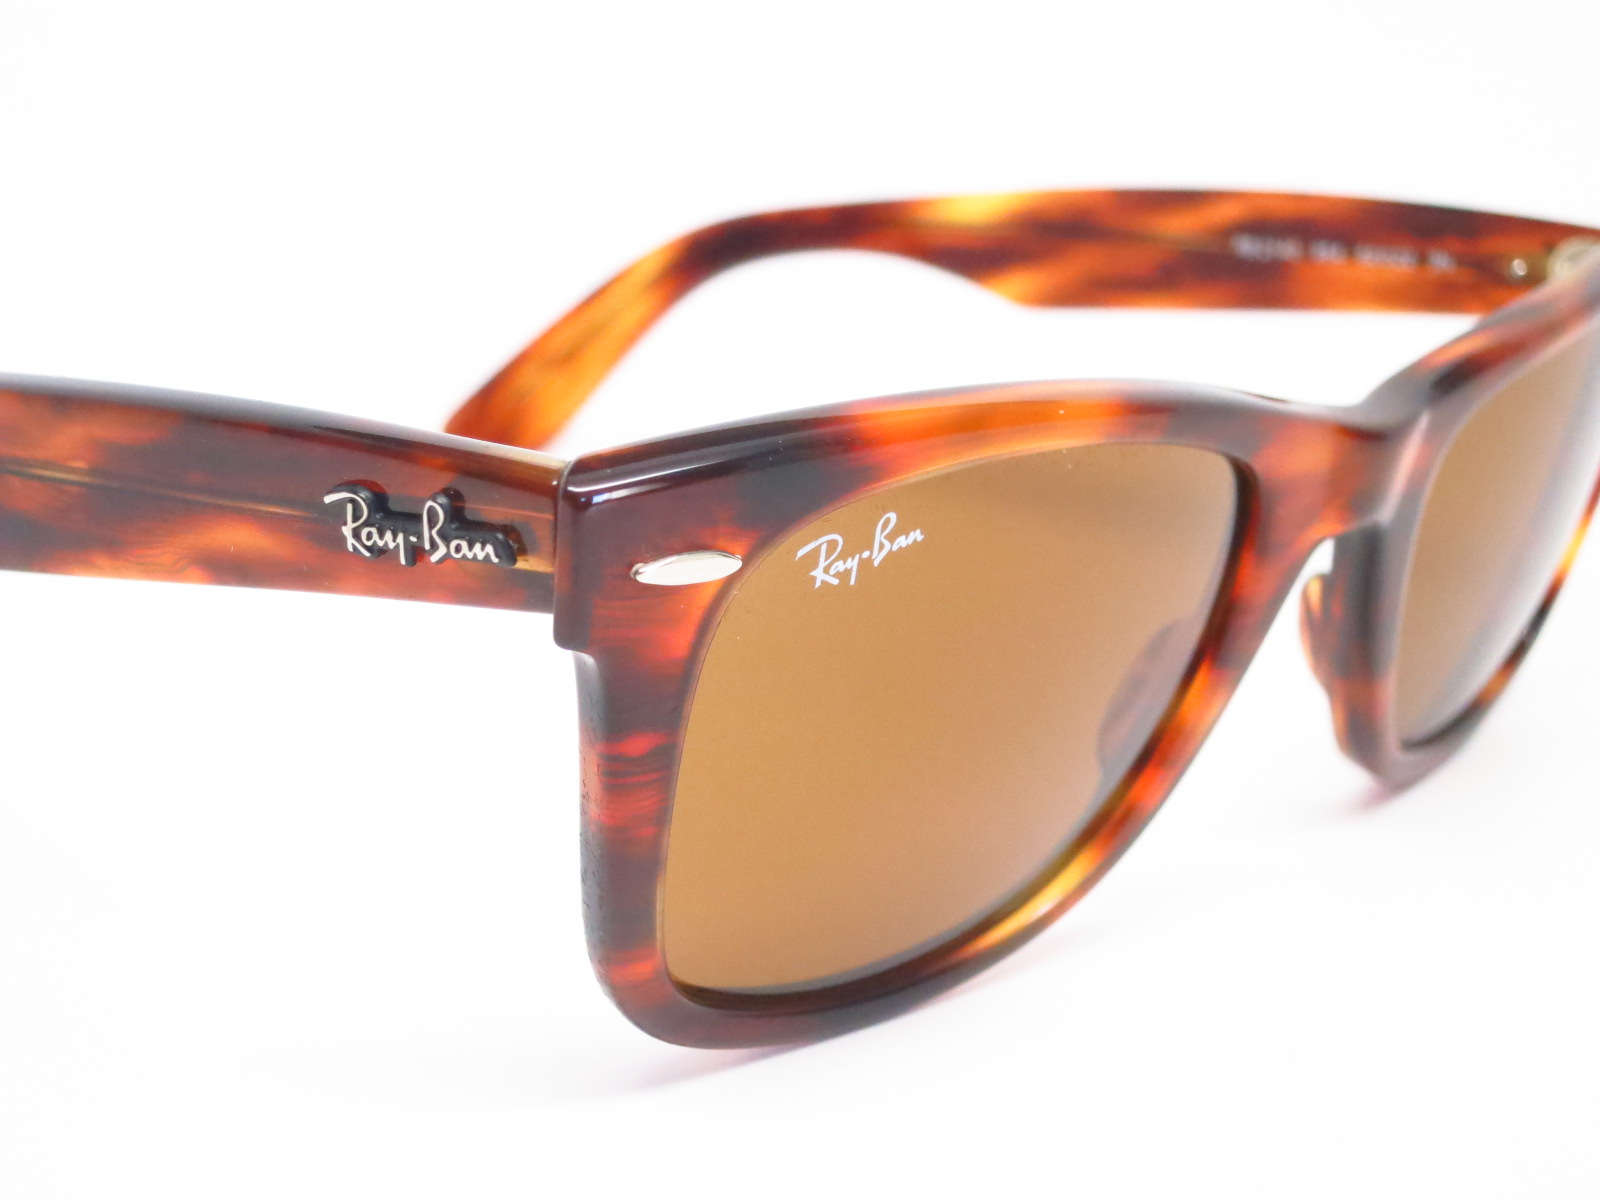 8a8cd5b55cf61 ... germany ray ban rb 2140 original wayfarer 954 light tortoise sunglasses  98306 f49fa